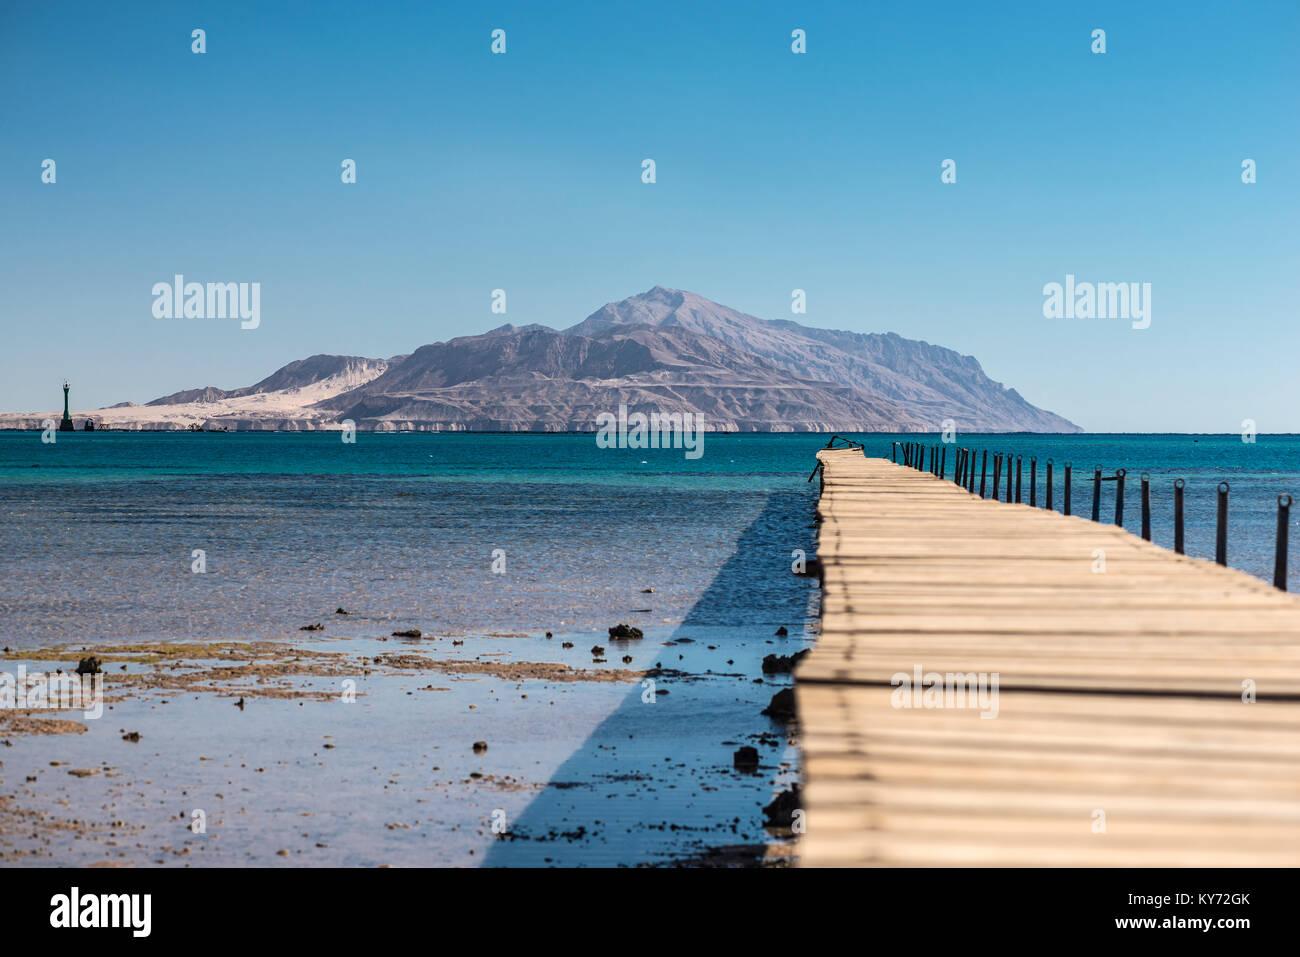 Alte hölzerne zerstörte Brücke auf dem Weg zur Insel Tiran Stockbild